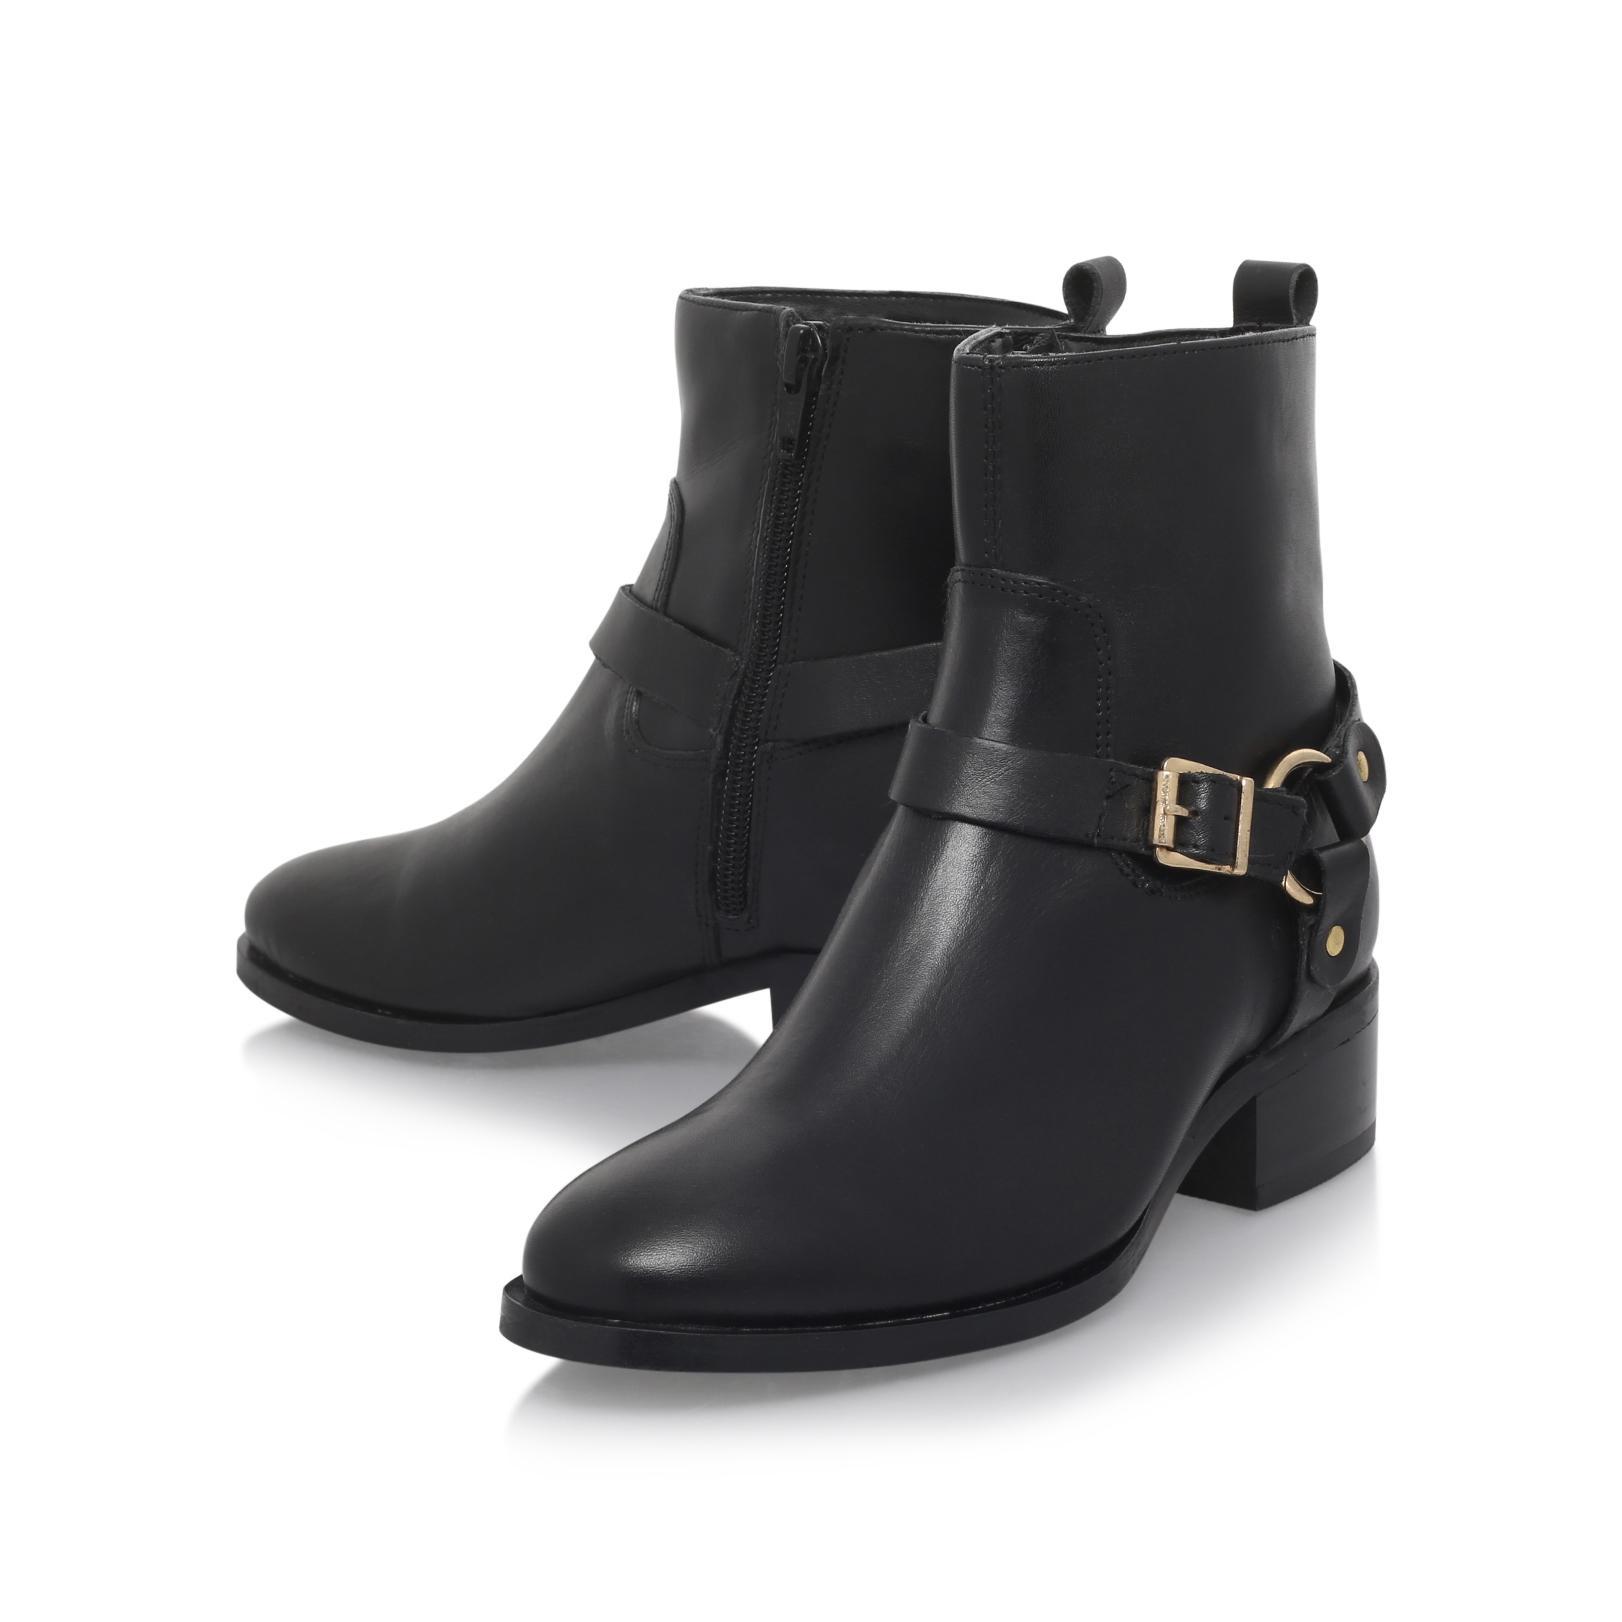 Carvela Kurt Geiger Leather Petro Flat Ankle Boots in Black